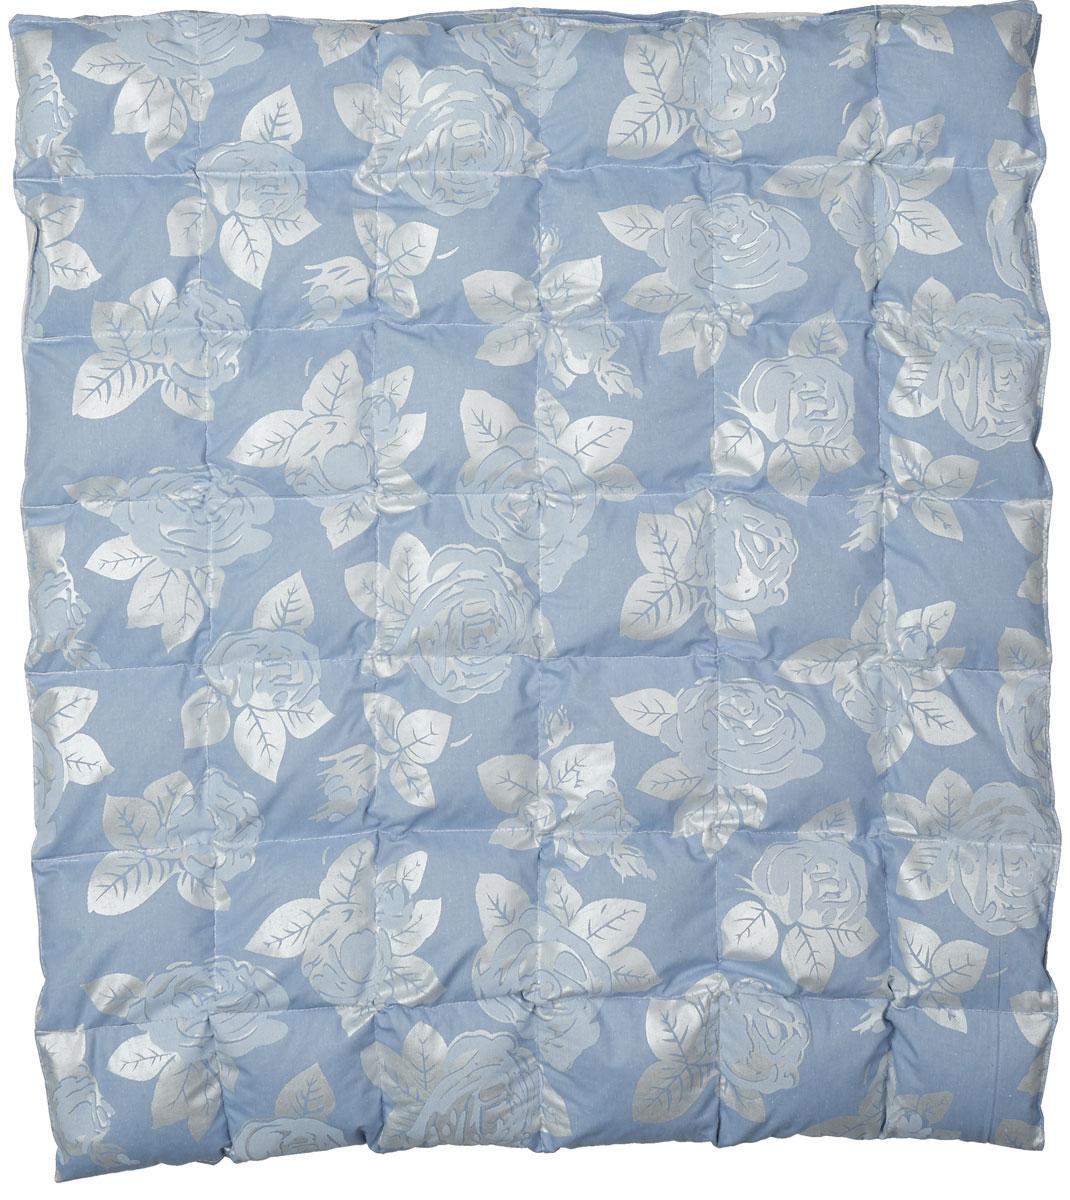 Наматрасник Bio-Textiles, наполнитель: лузга гречихи, 160 х 195 смNAL688